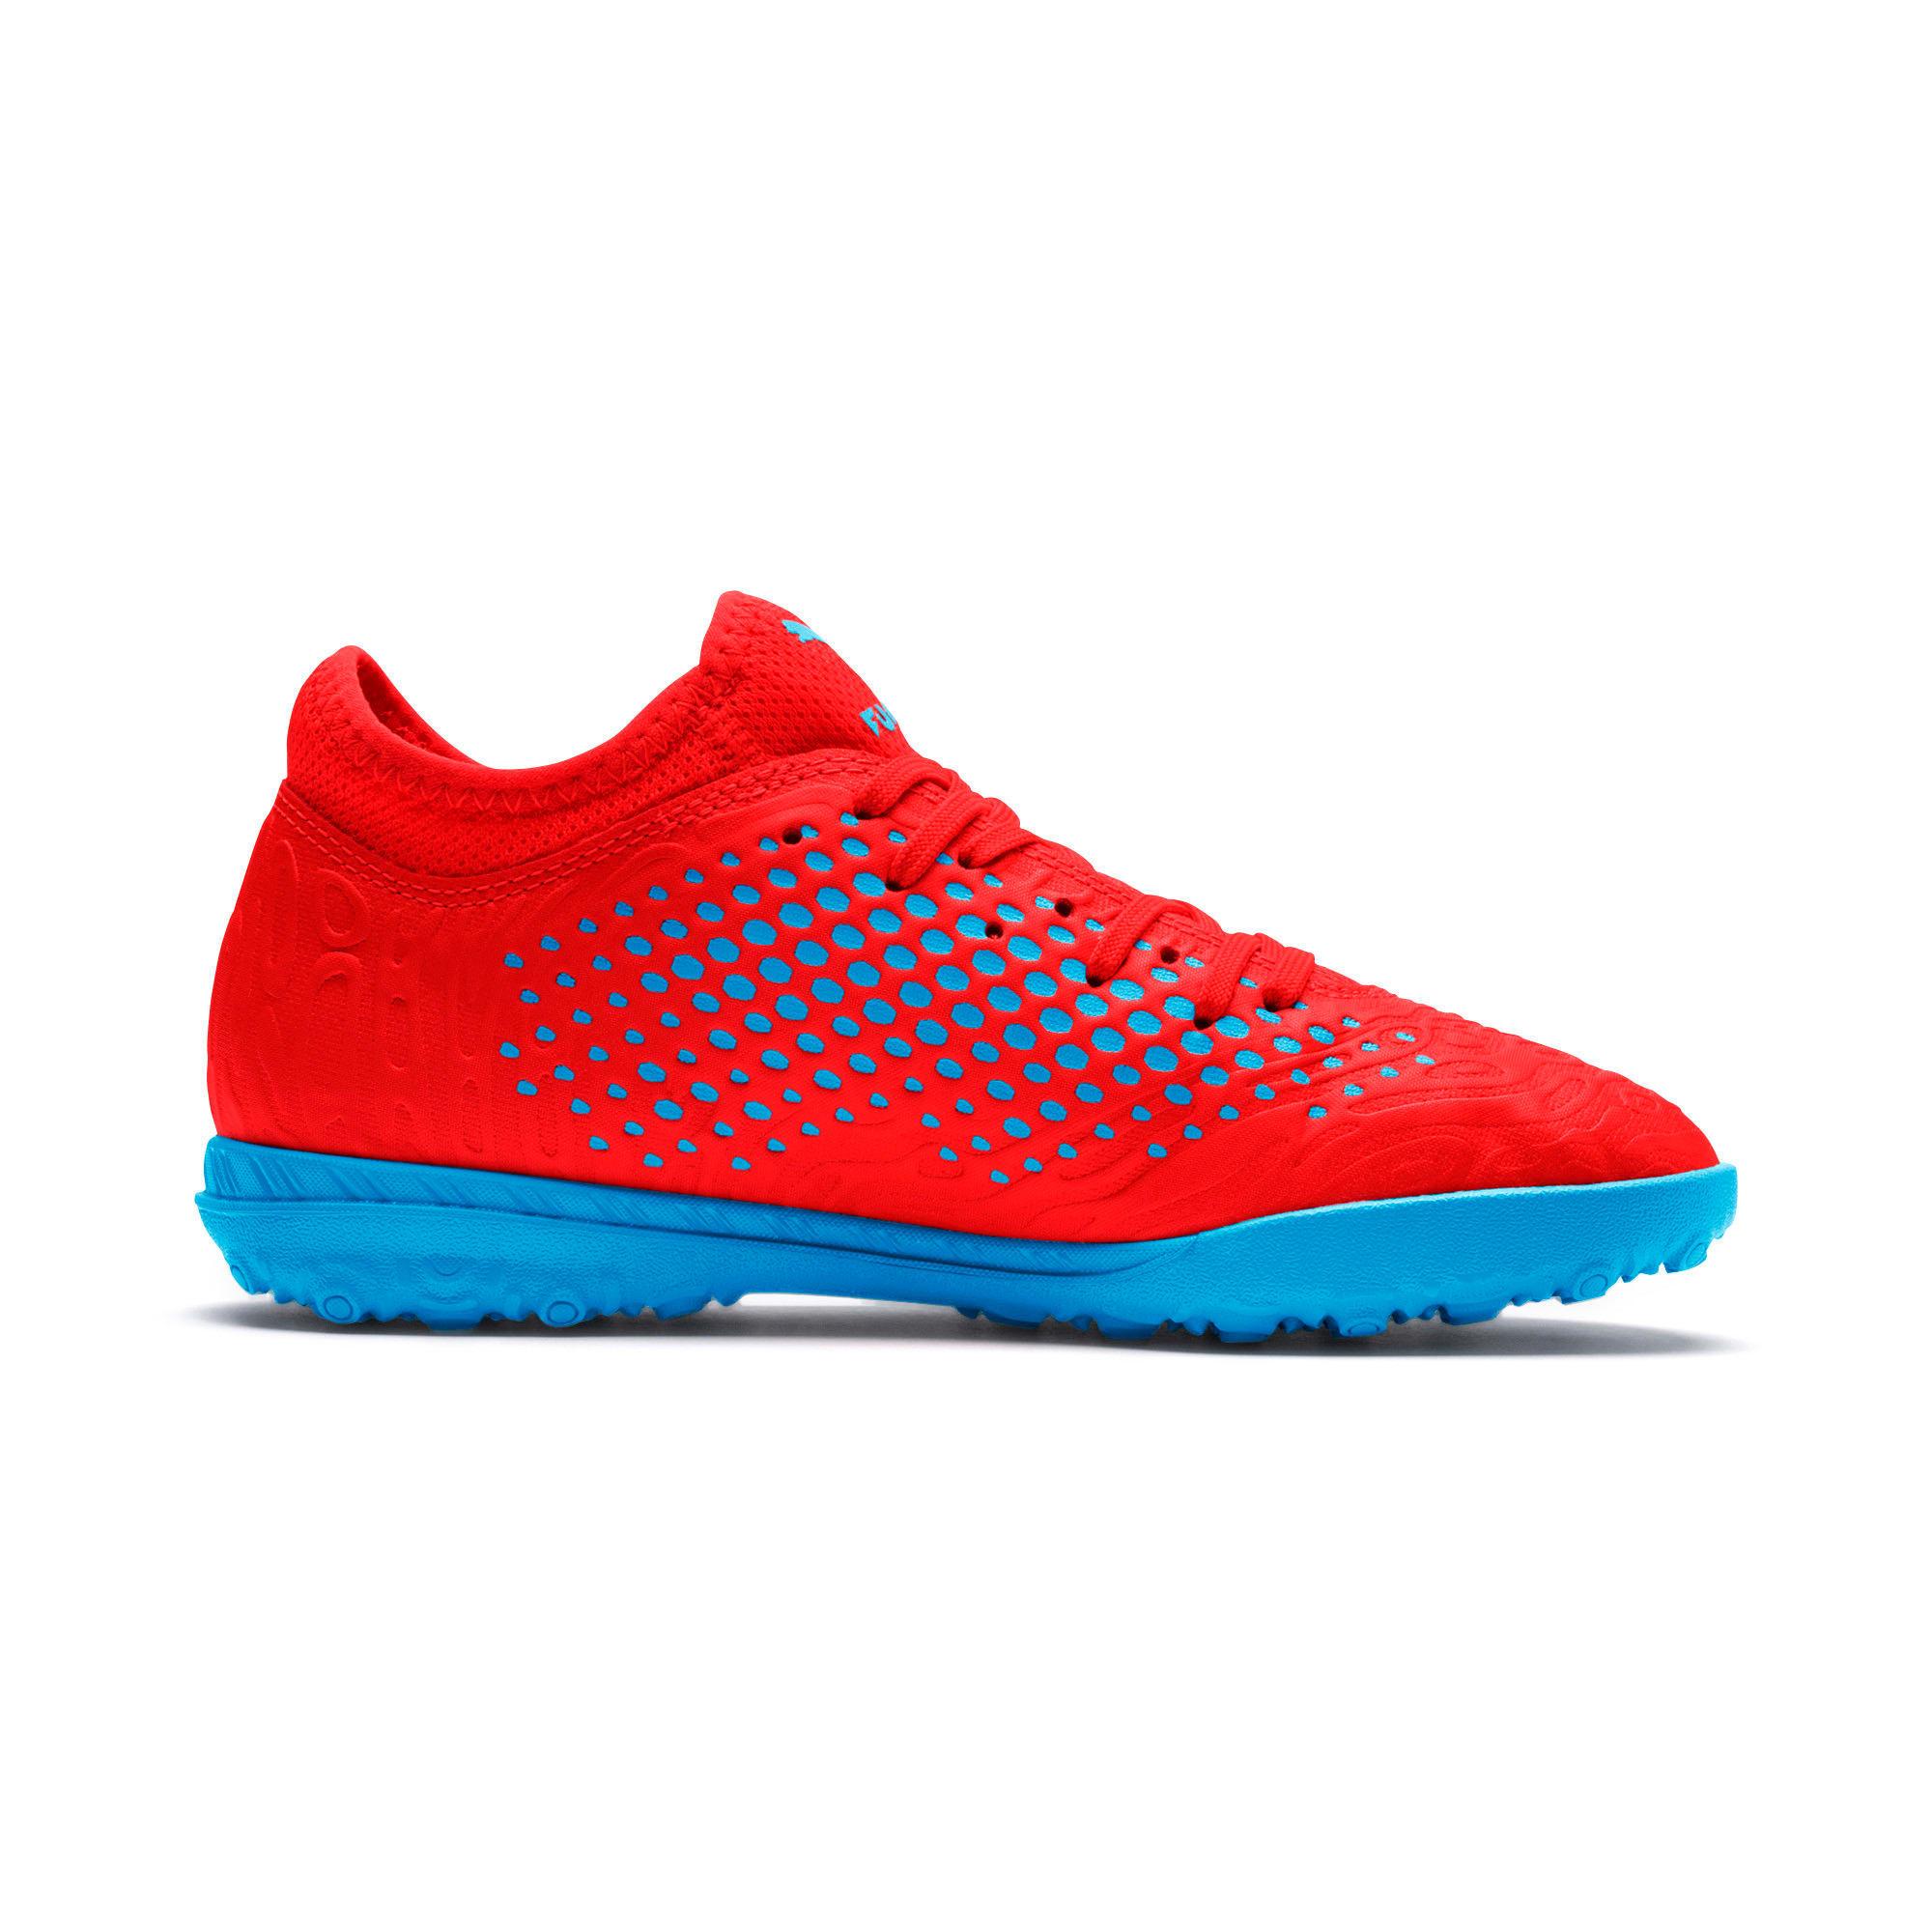 Thumbnail 5 of FUTURE 19.4 TT Soccer Shoes JR, Red Blast-Bleu Azur, medium